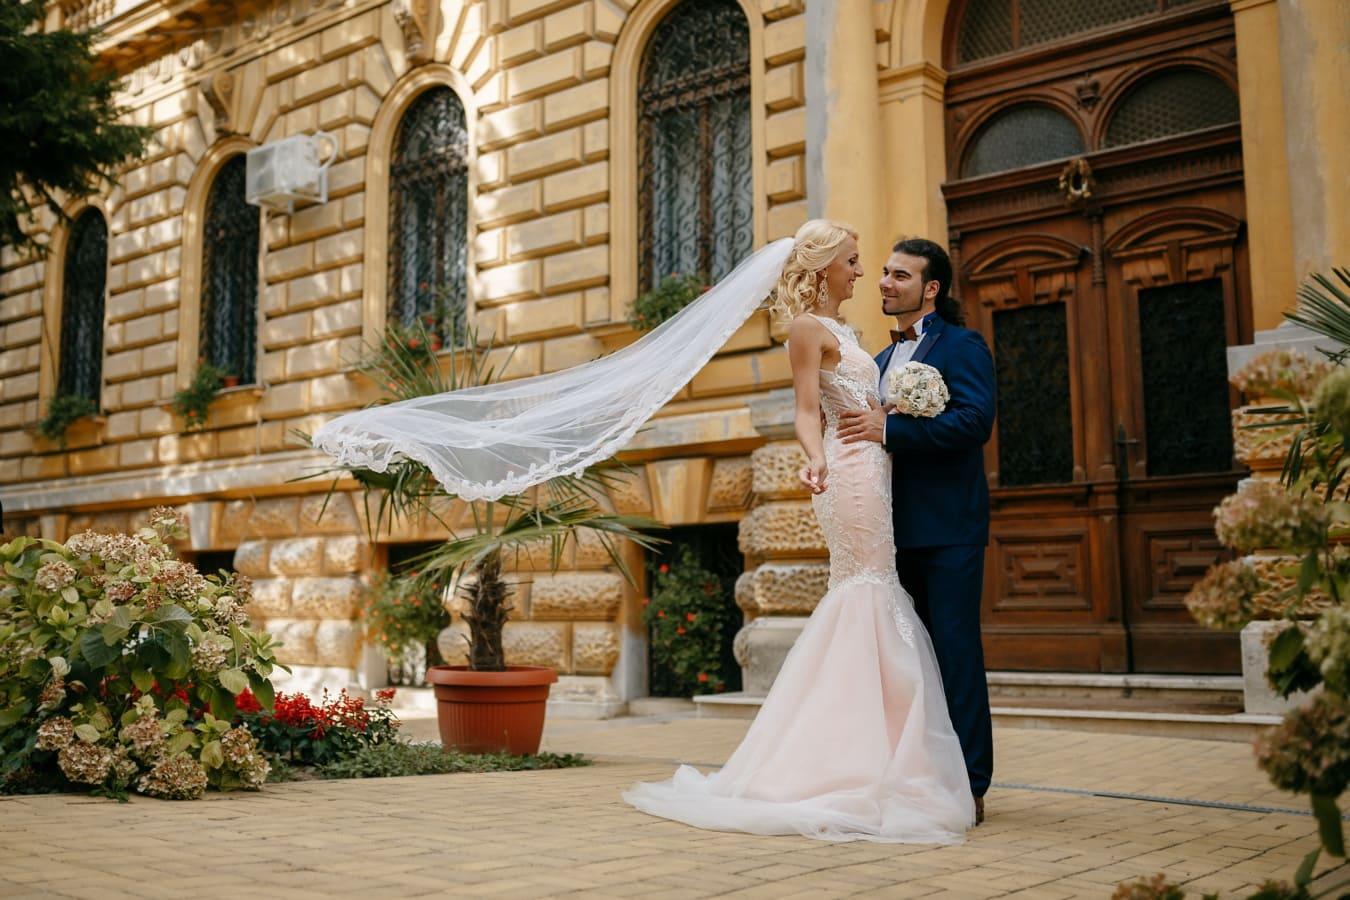 wedding dress, groom, just married, bride, cheerful, glamour, fashion, wedding, marriage, love